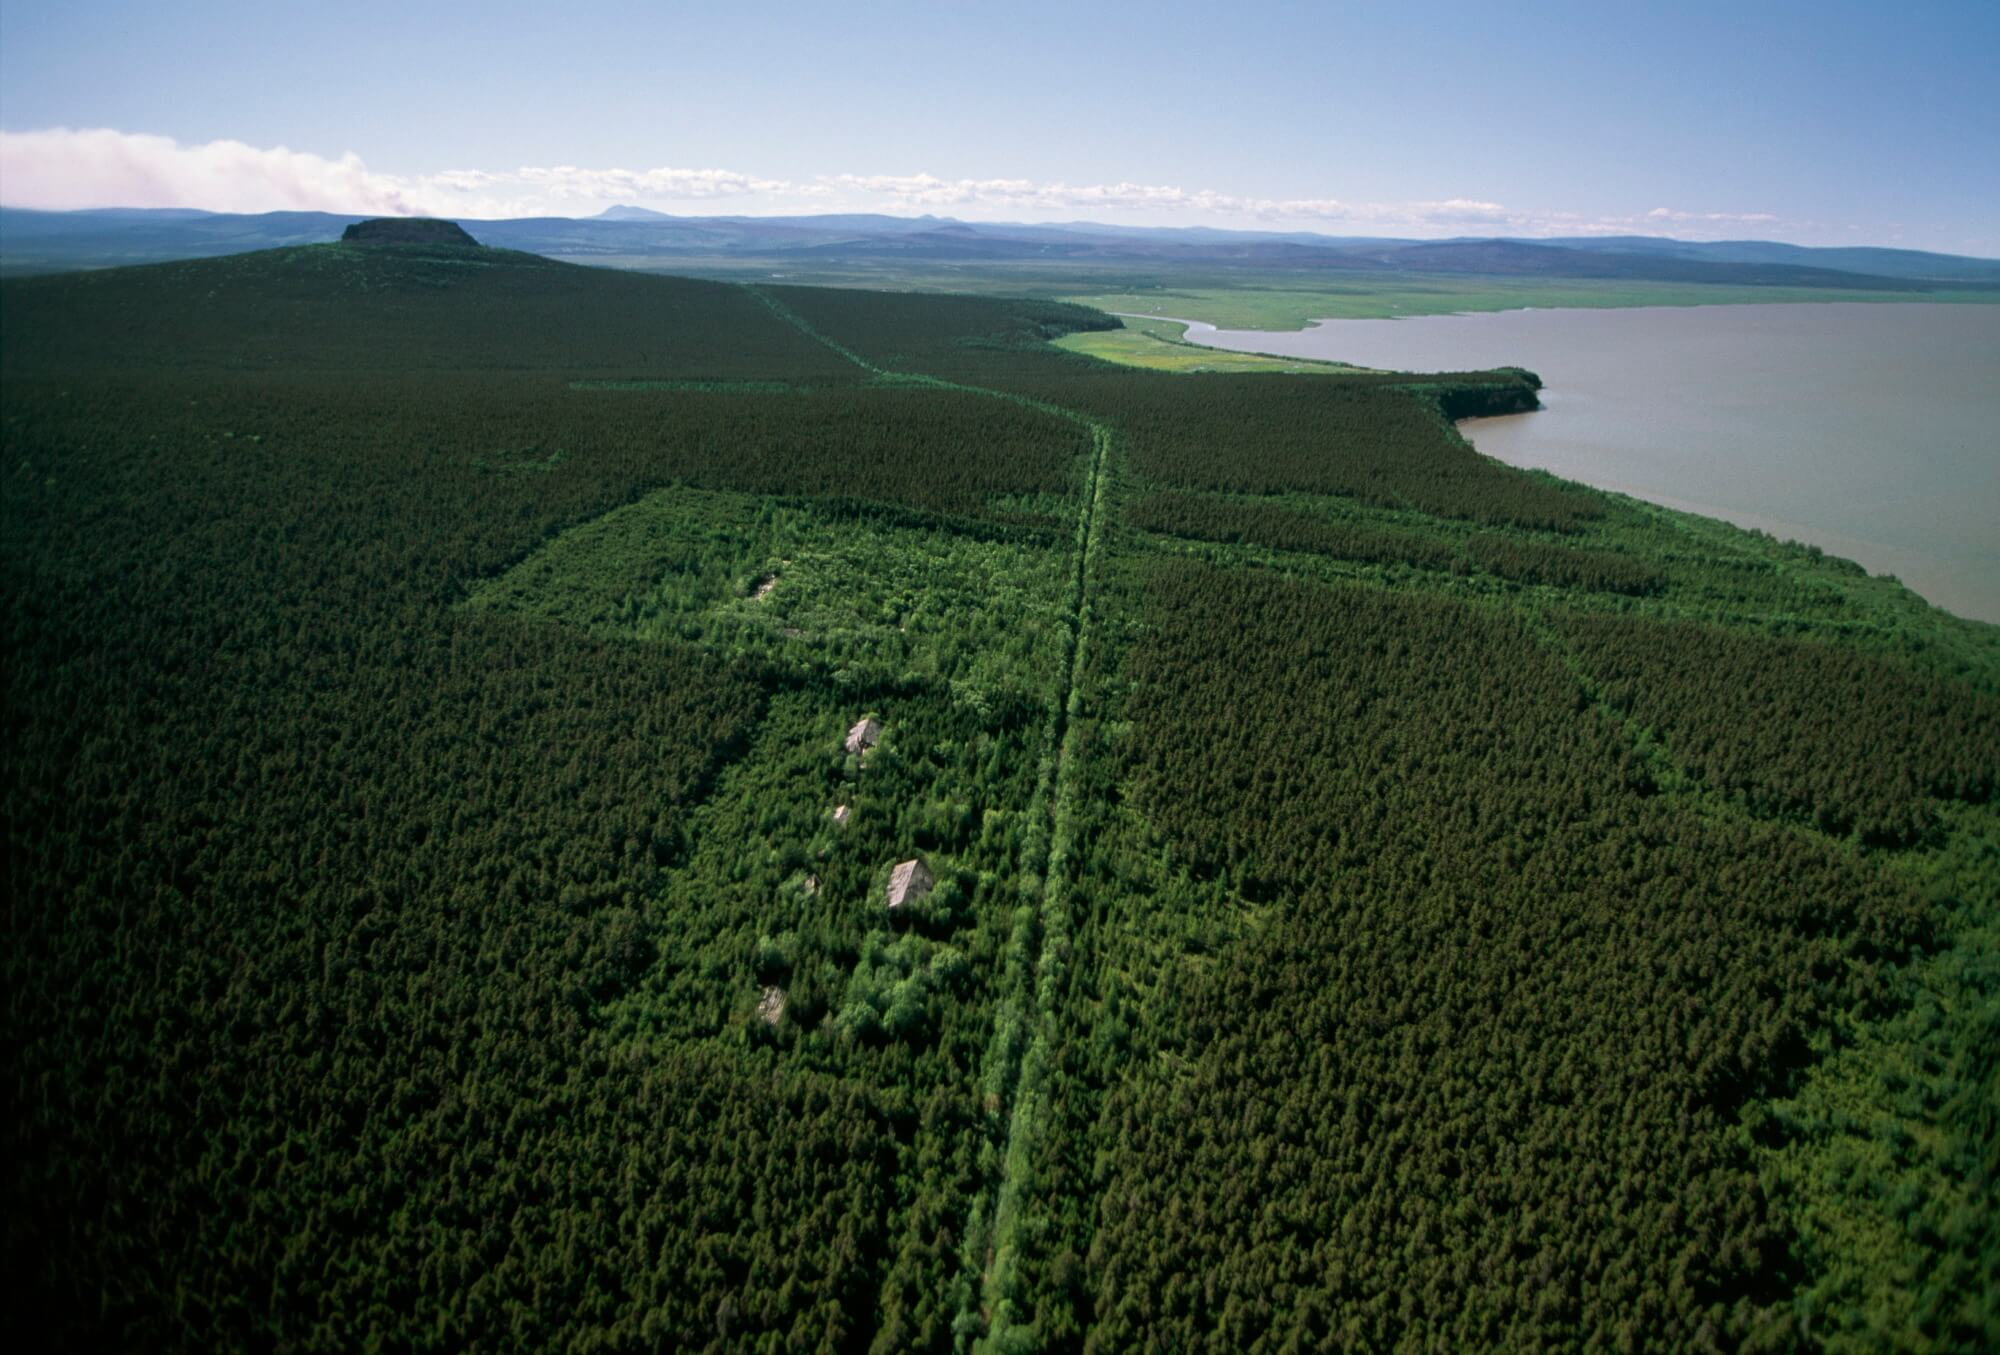 Fédération de Russie, Camp 507, Cap Nevelsky, 1999 - © Reza